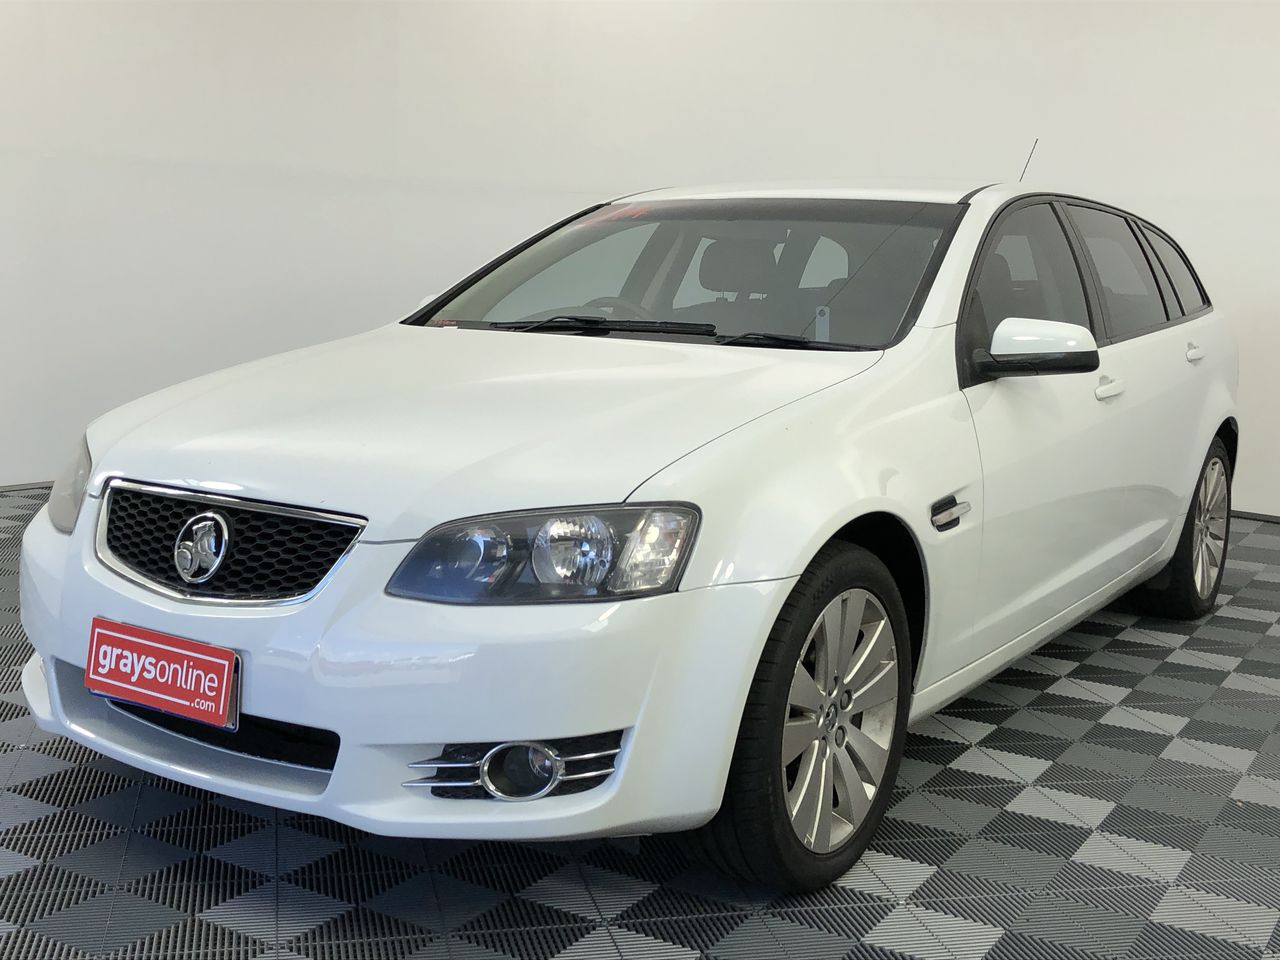 2012 Holden Sportwagon Equipe Z-SERIES VE II Automatic Wagon